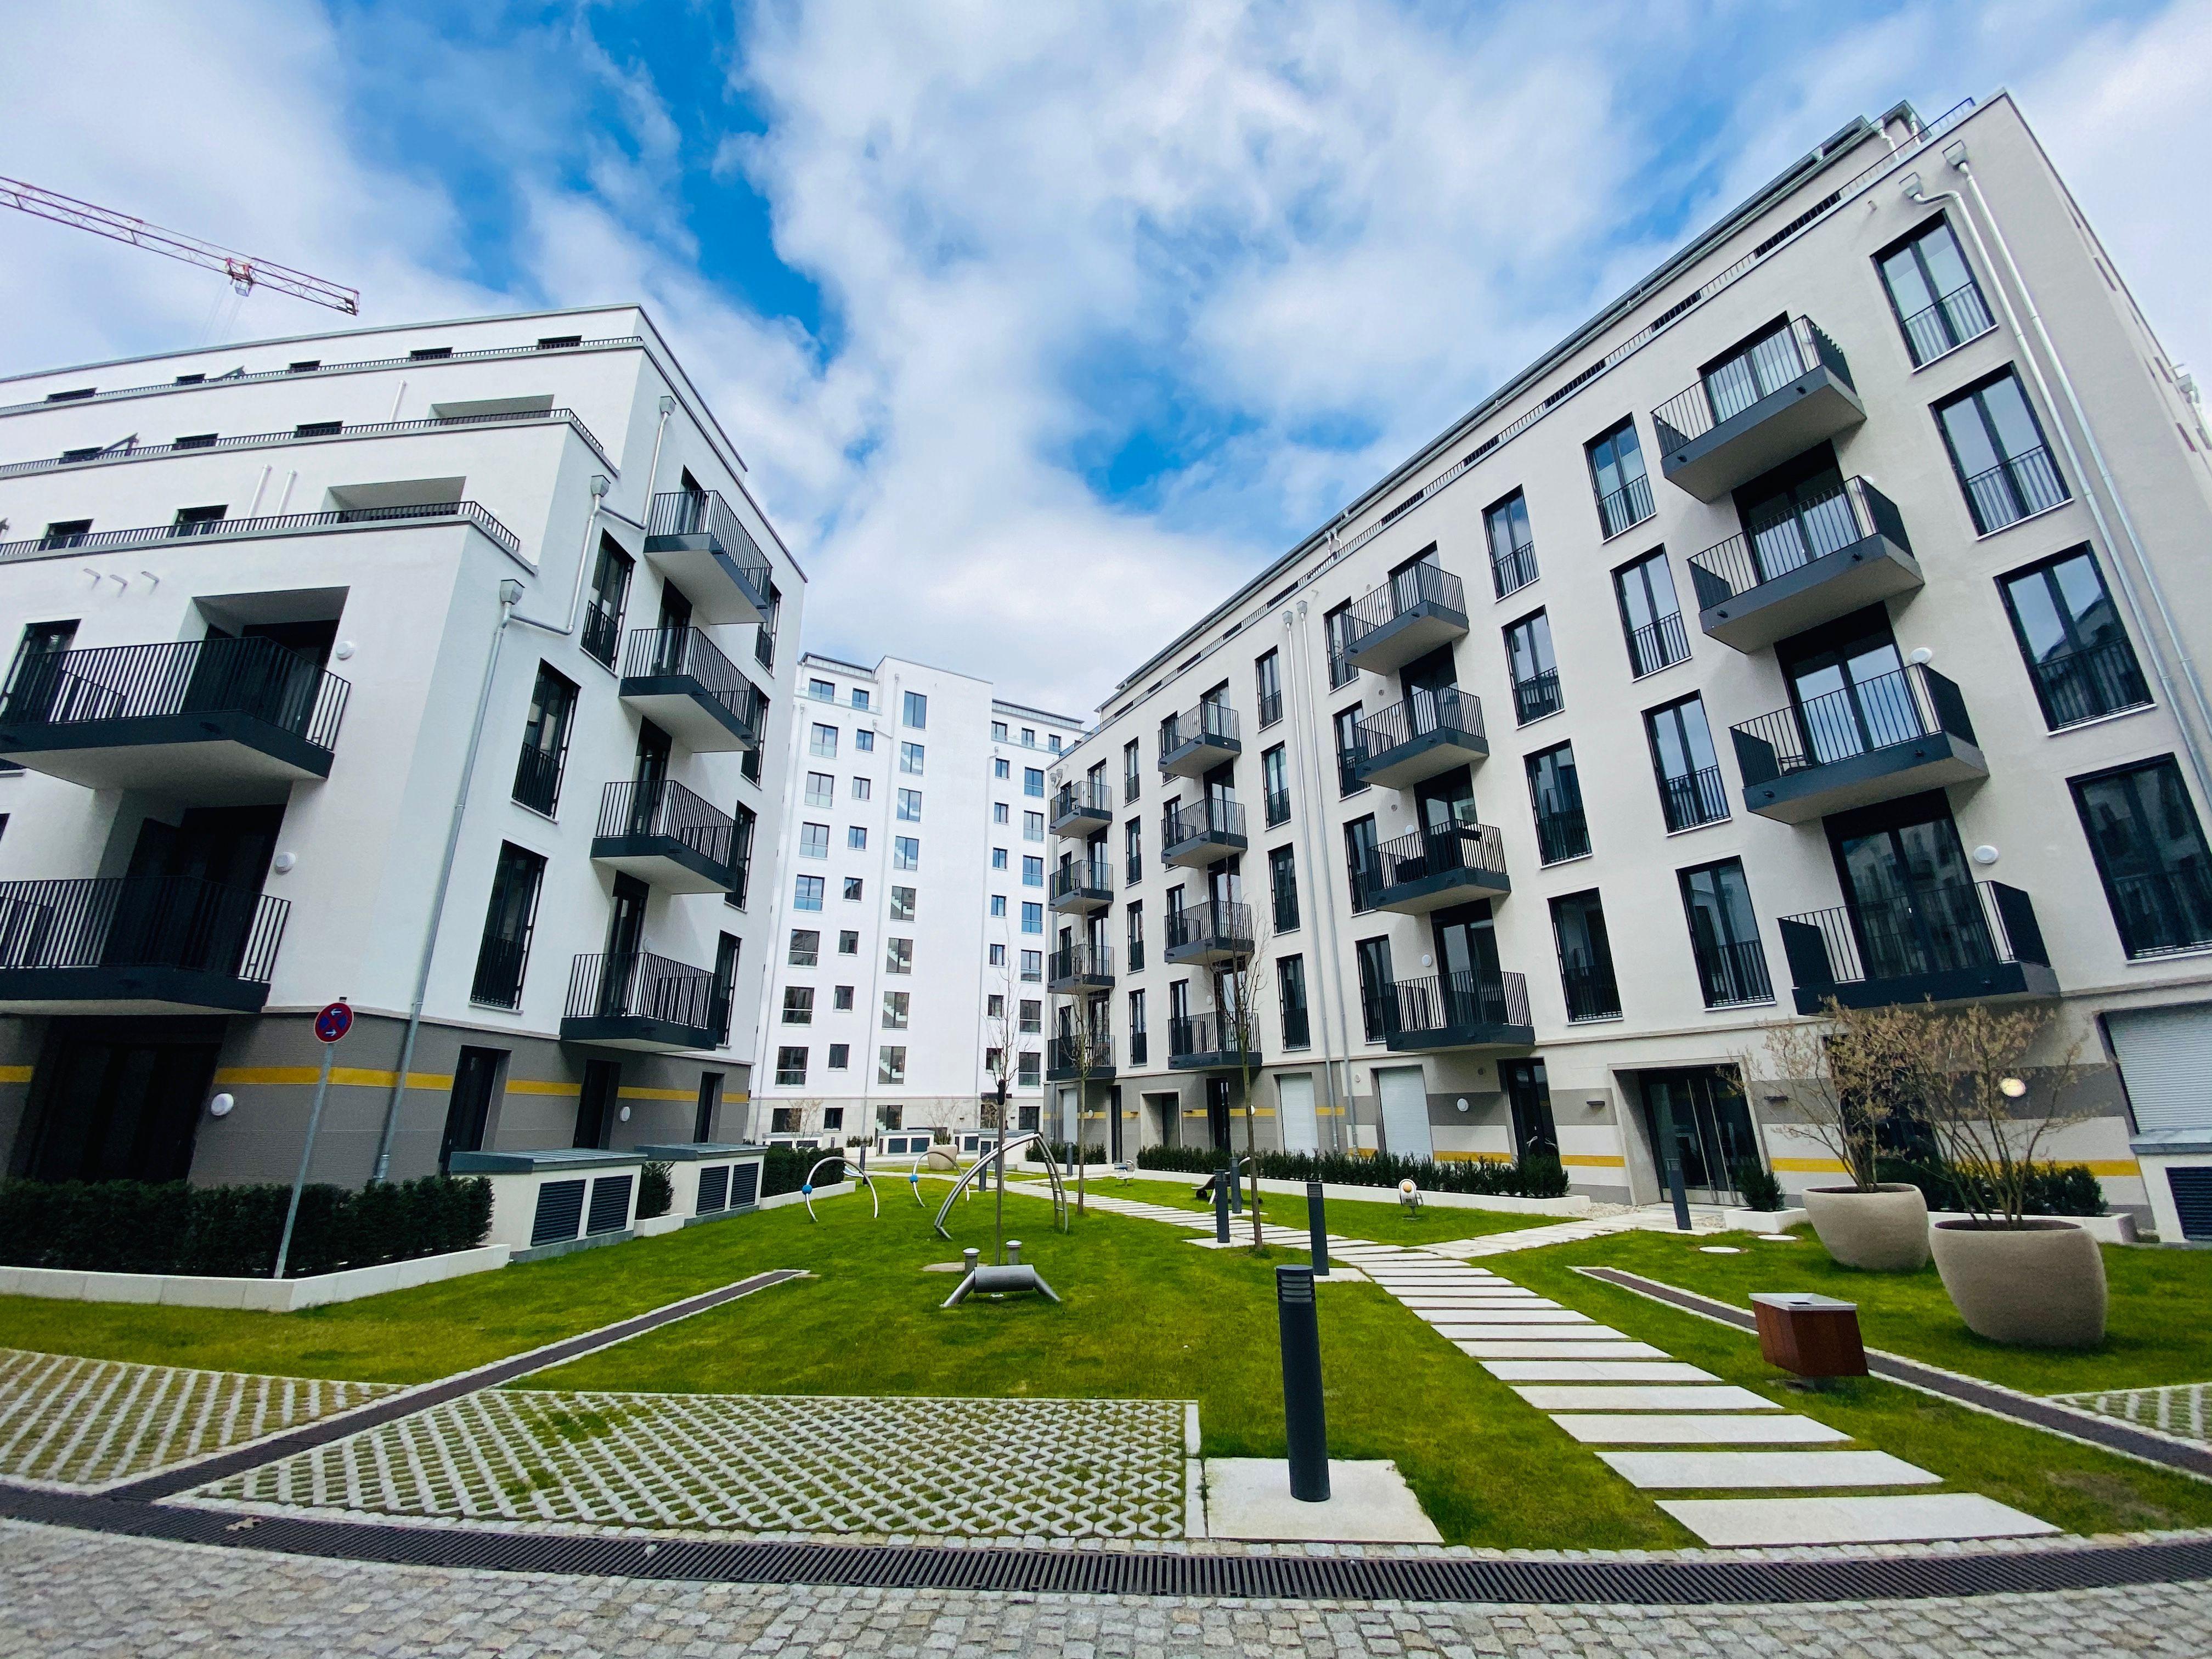 New apartments in Friedenau, Berlin